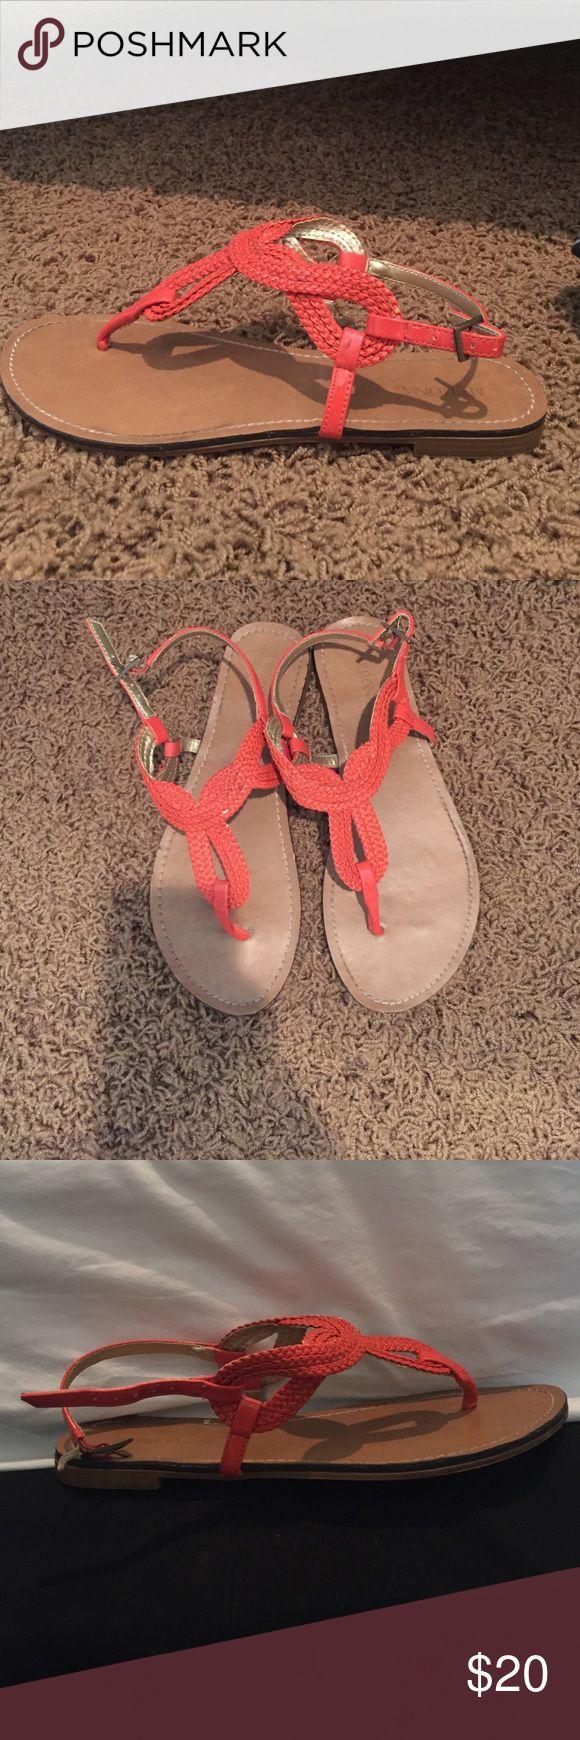 Orange braided Sandals Worn one, original from Nordstrom, orange sandals, great for summer Merona Shoes Sandals